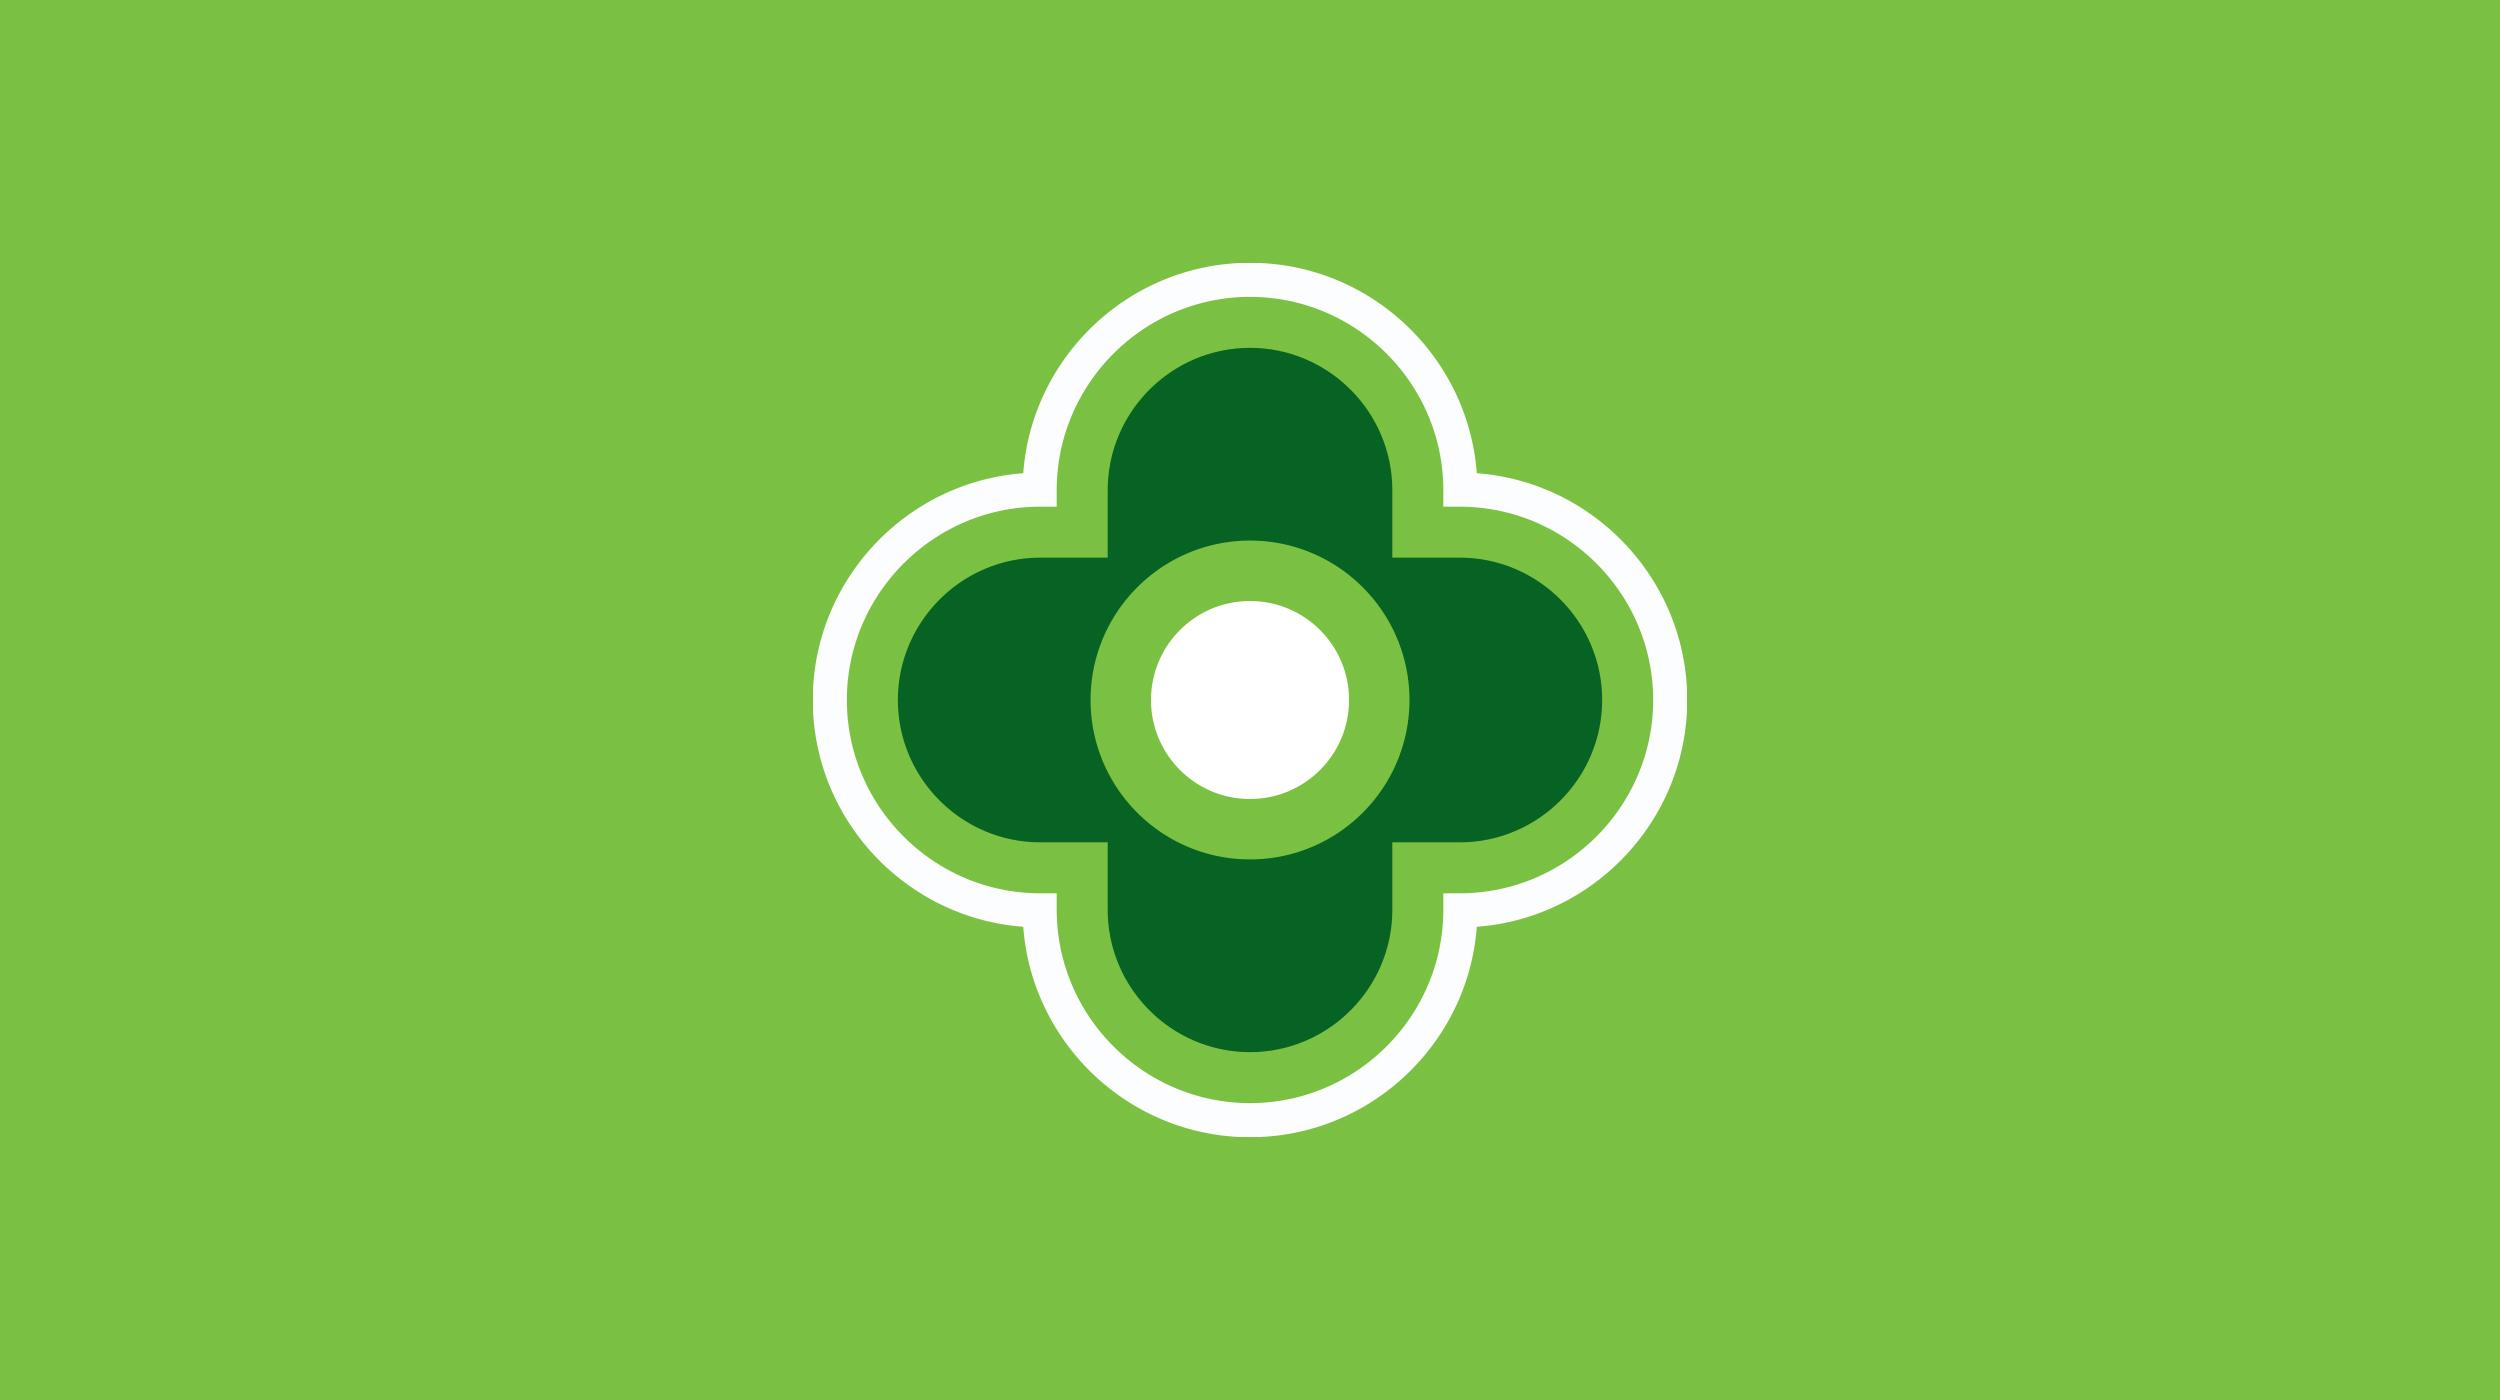 logo-mark.jpg